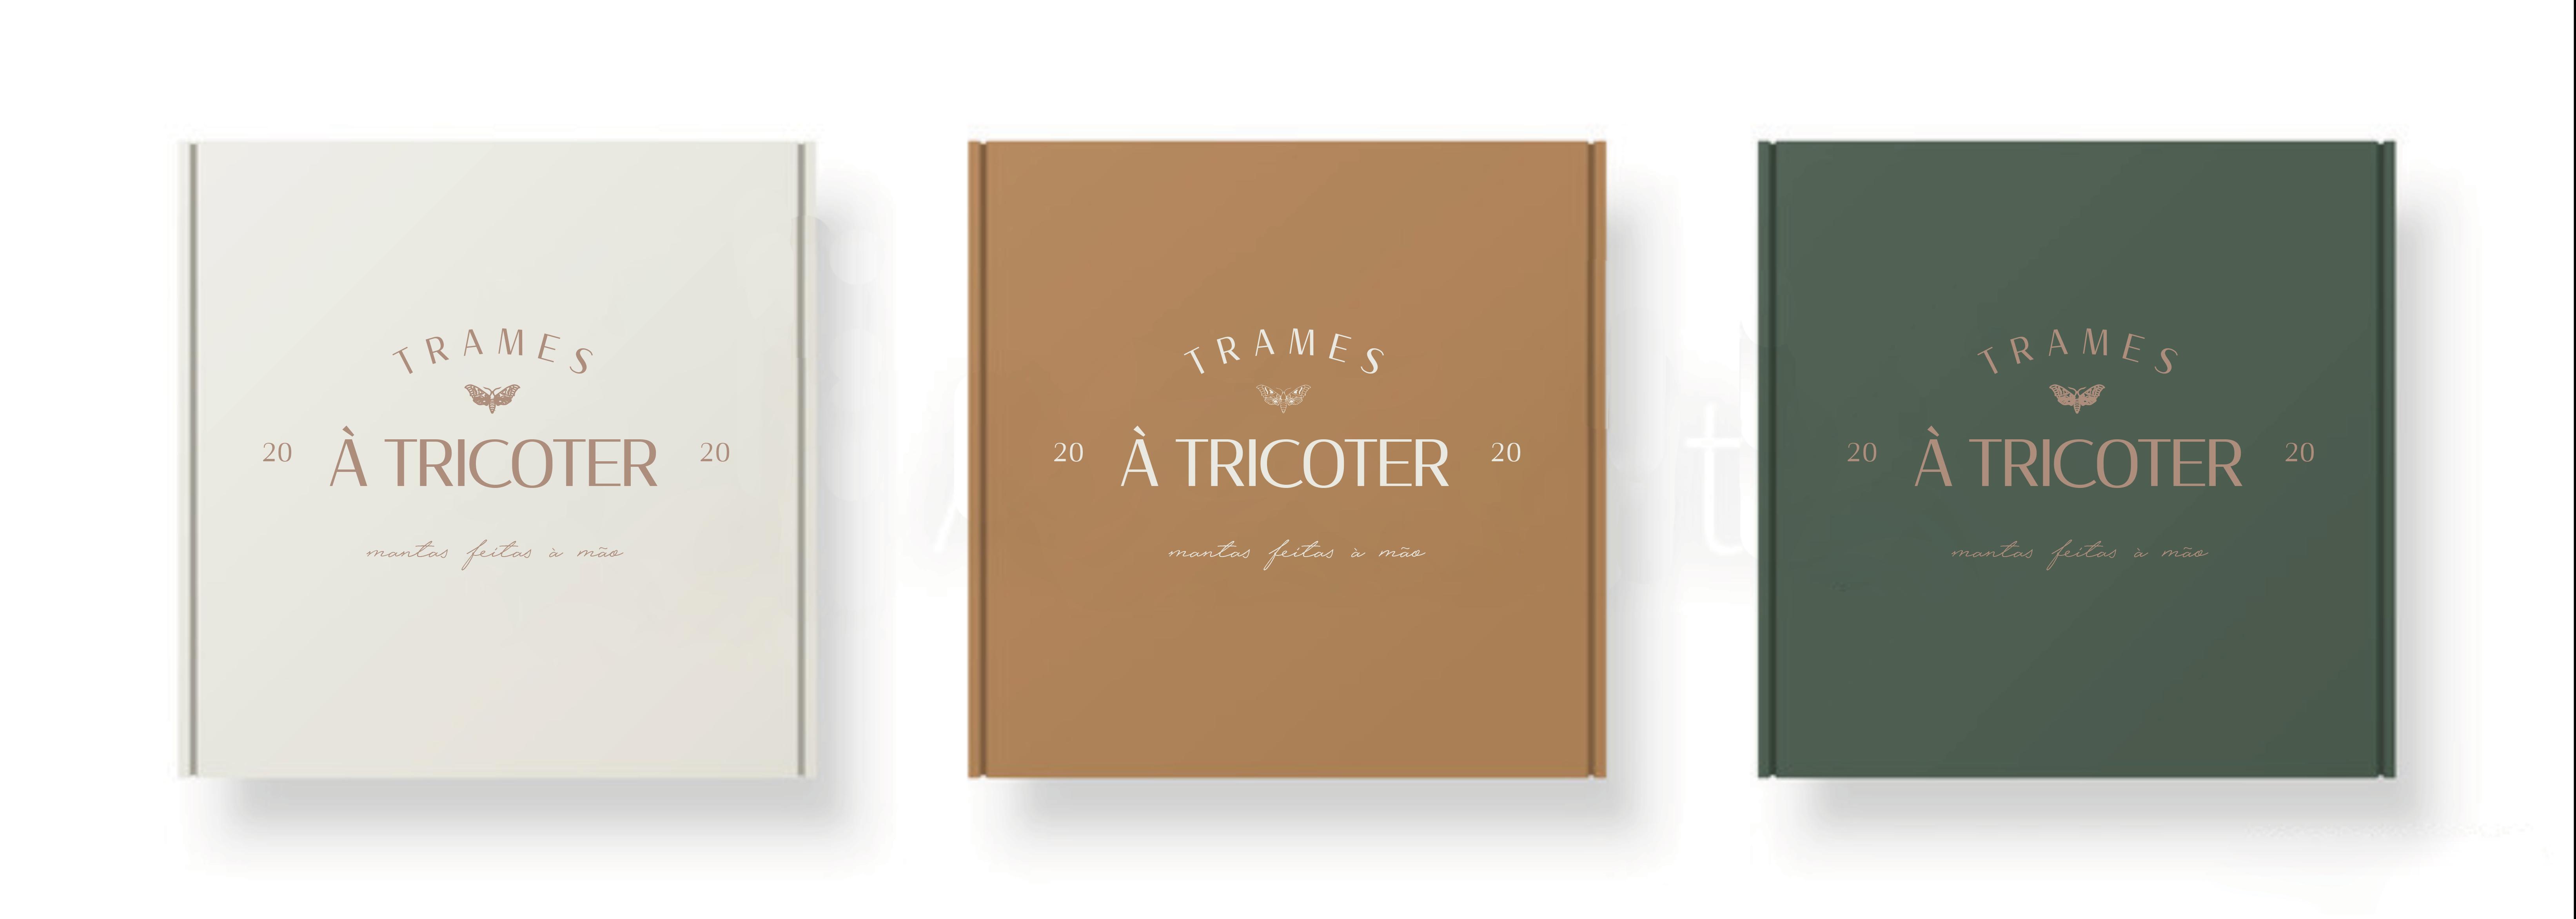 TRAMES_À_TRICOTER-2